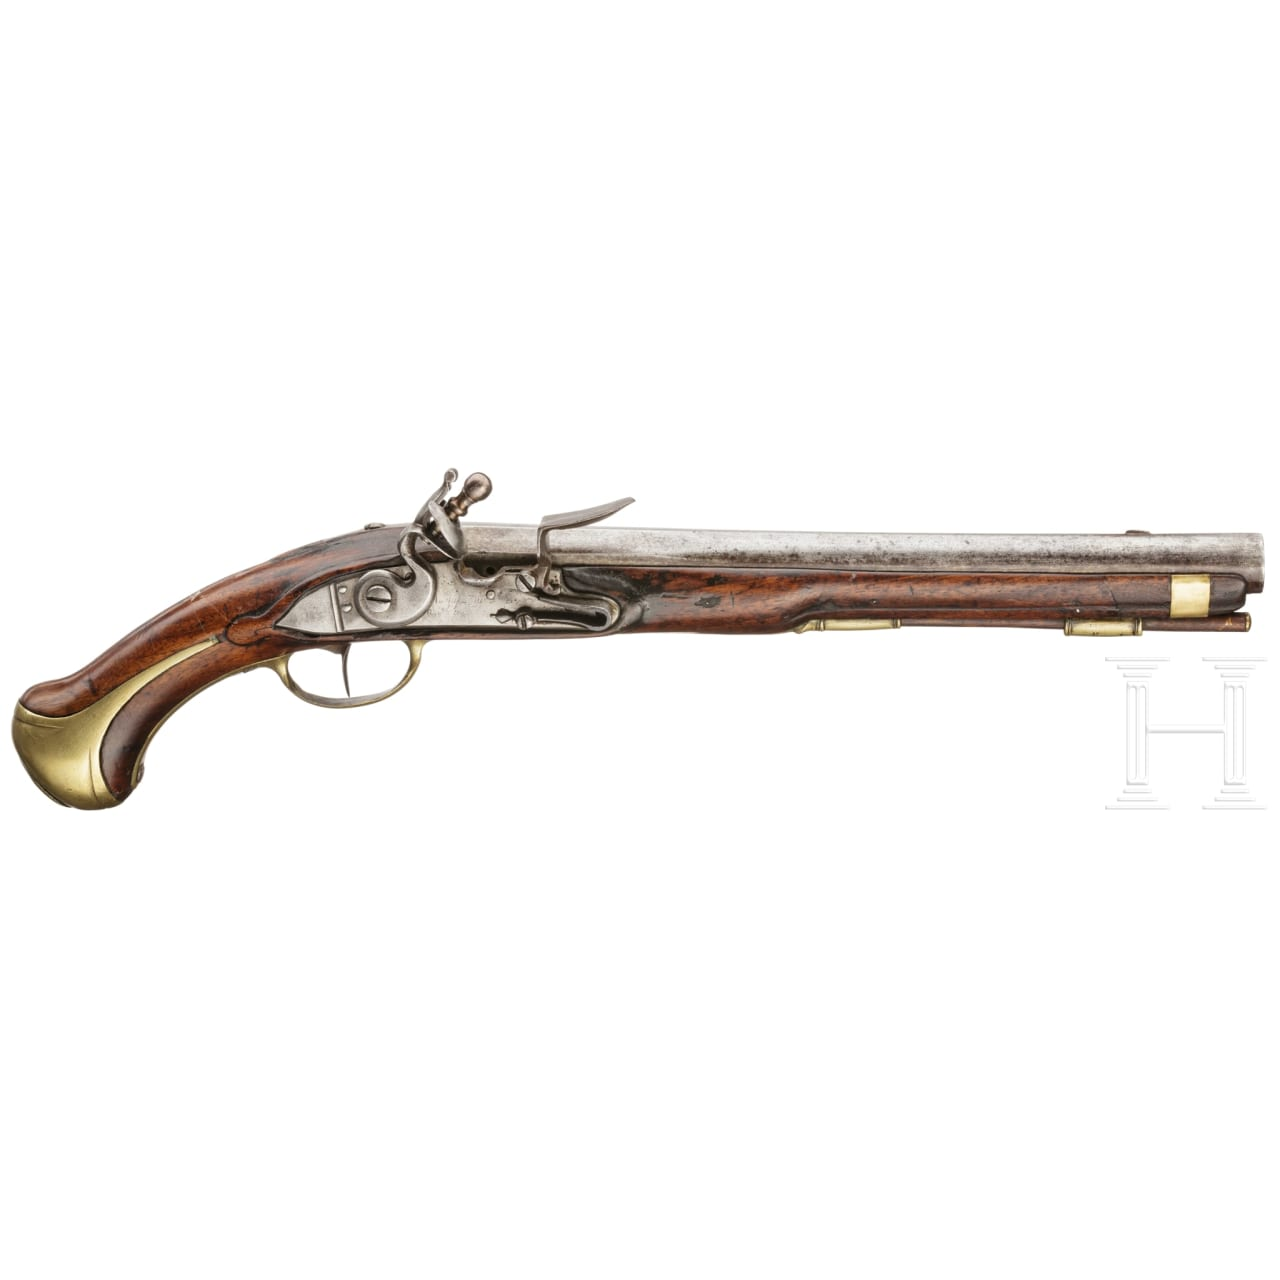 A French flintlock cavalry pistol similar to Mod. 1733/34, Charleville, circa 1740